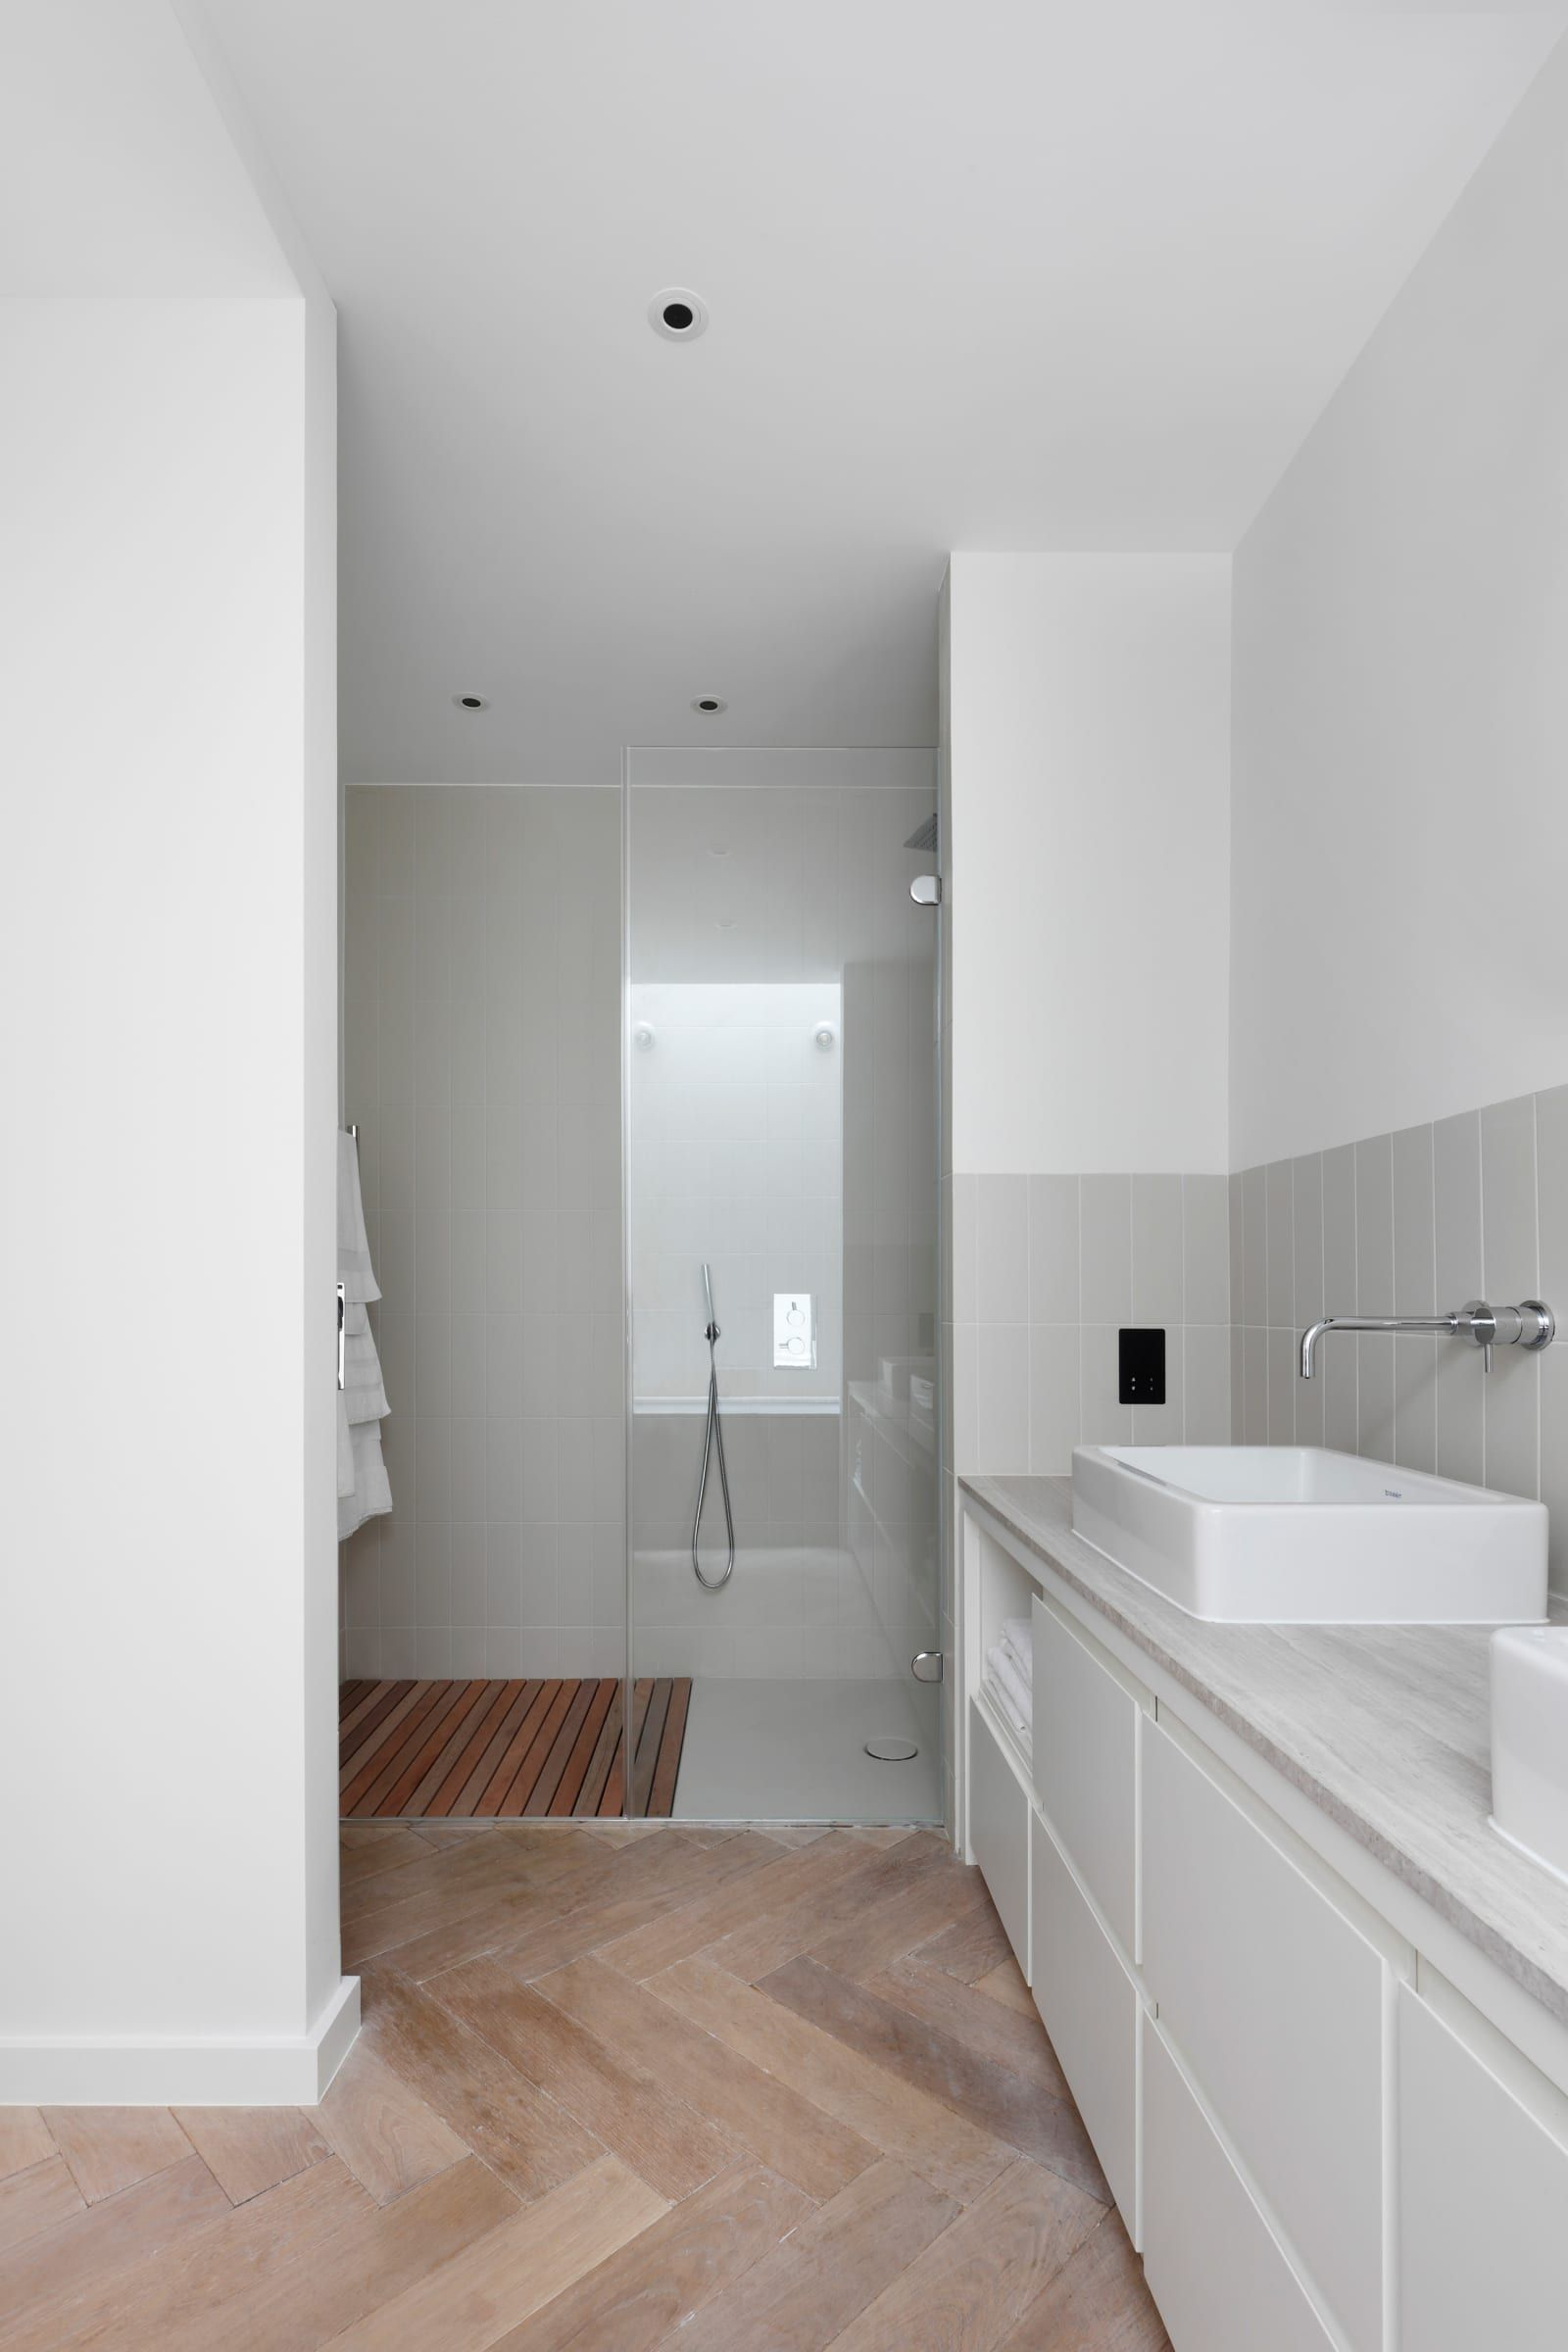 De Rosee Sa Architects, Alexander James Courtyard House